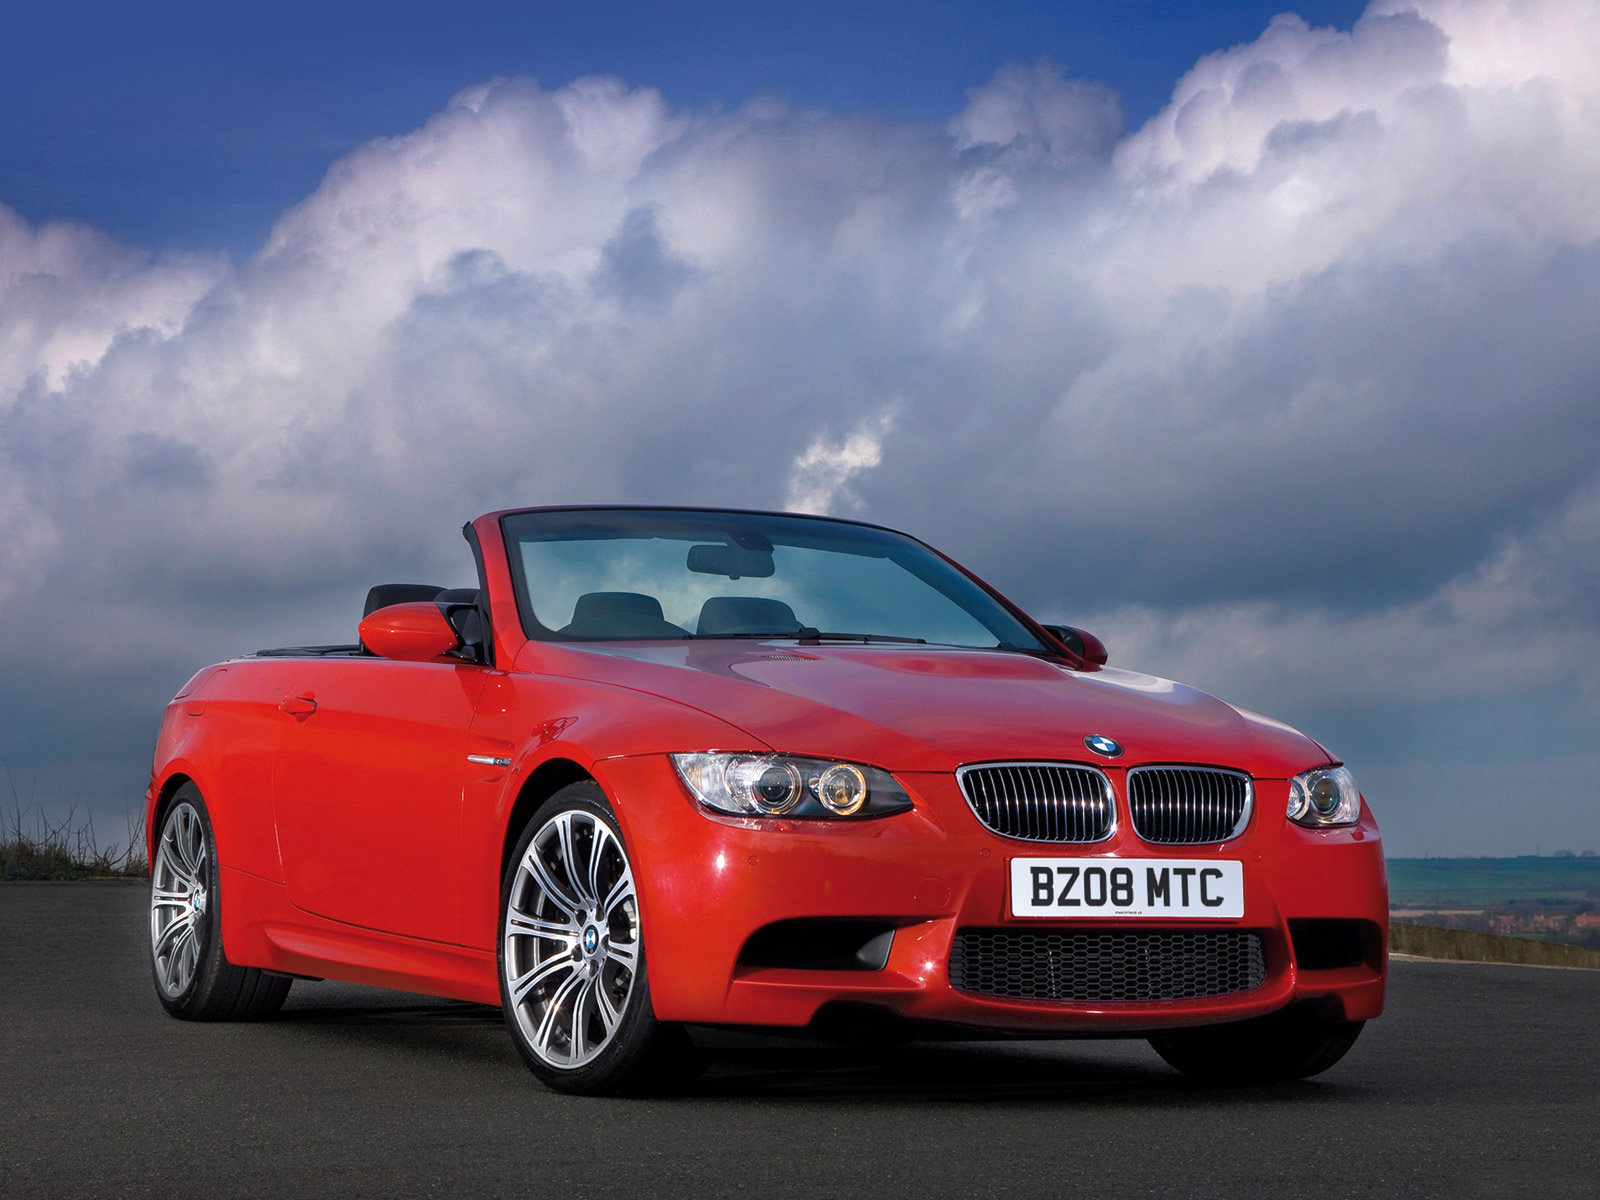 2009 BMW M3 Convertible UK Version wallpaper - Auto Trends Magazine